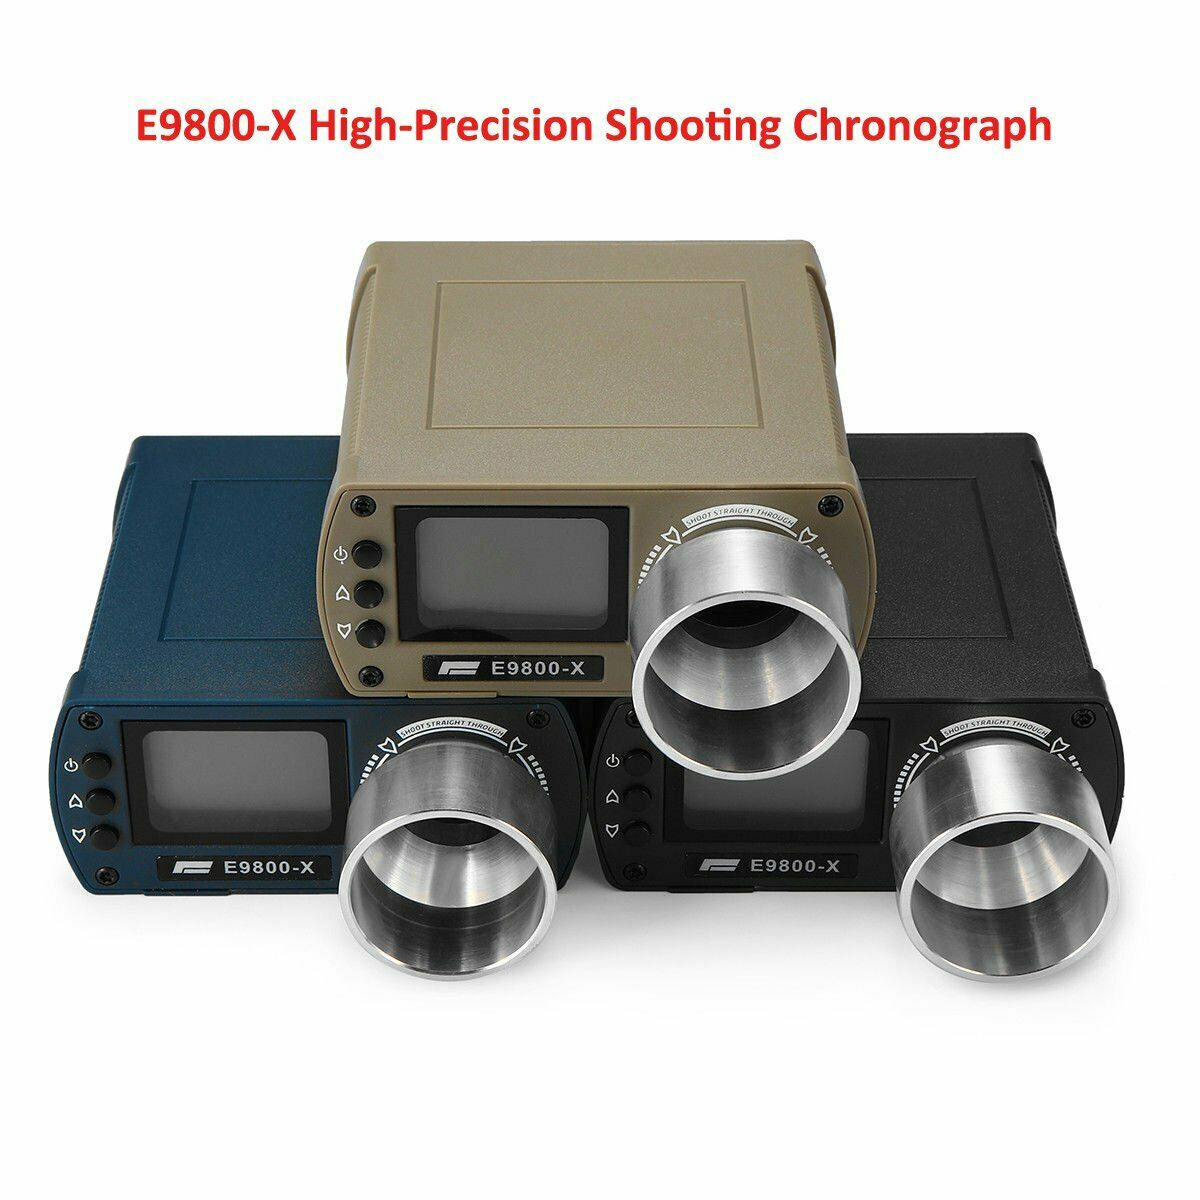 E9800-X High-Precision Shooting Chronograph Speed Tester Airsoft BB Tool Measure